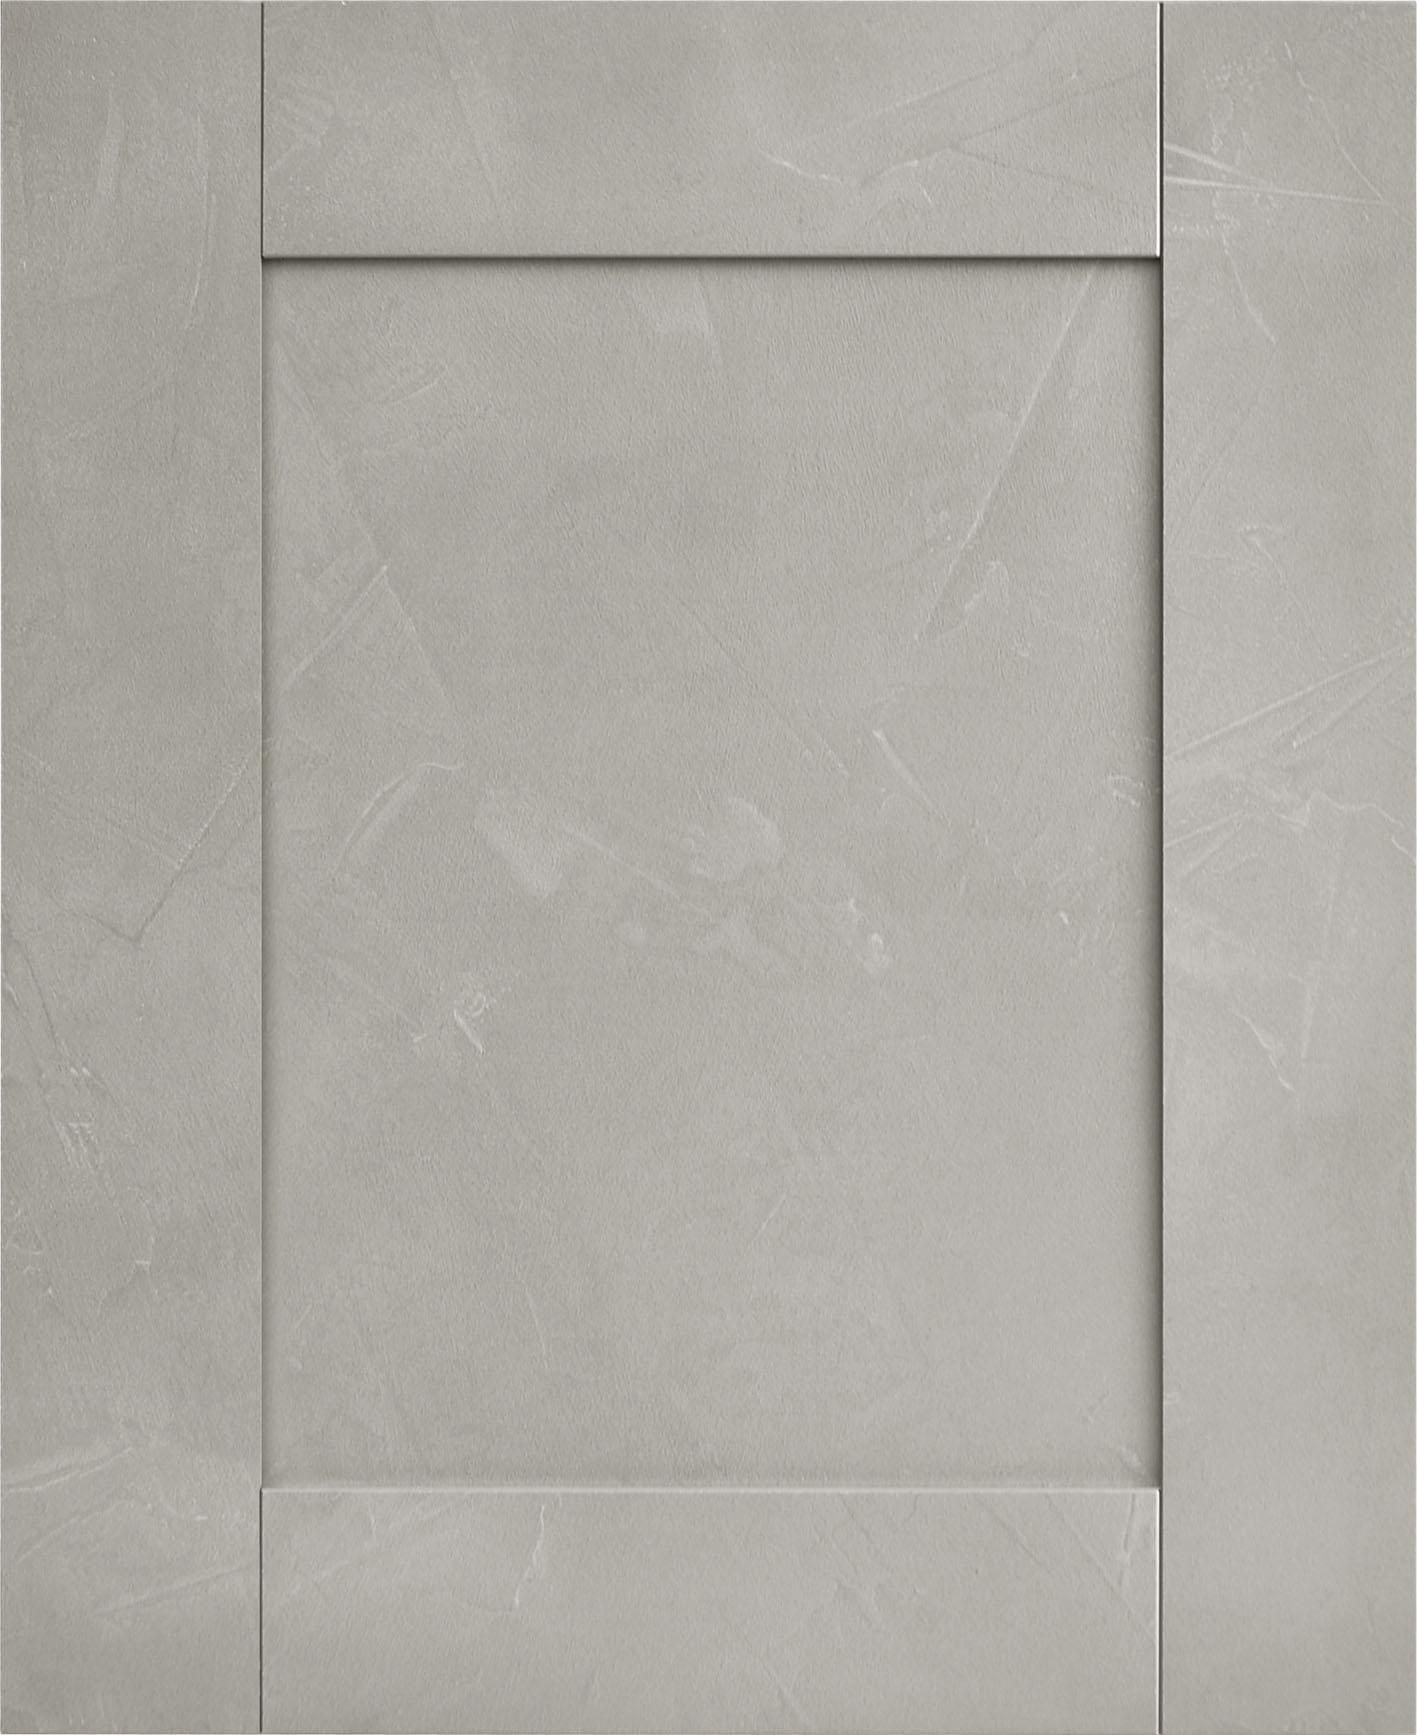 Square Frame 0569-SQ